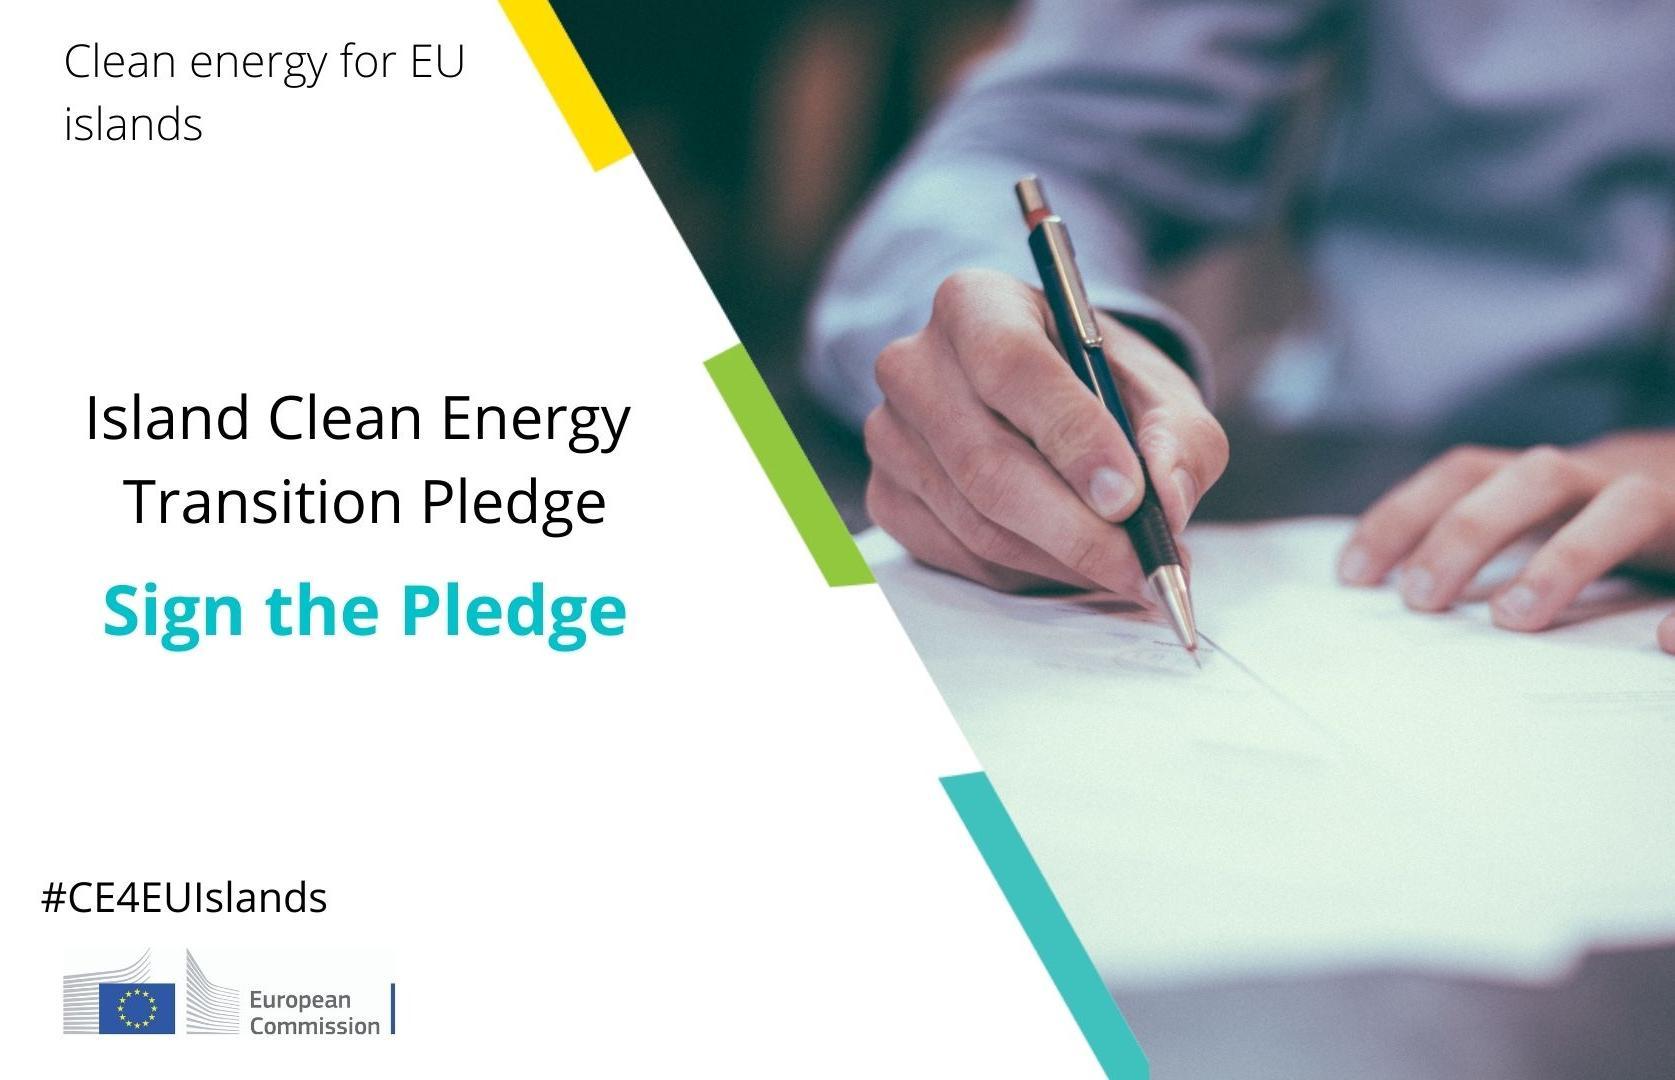 Sign the EU islands Pledge